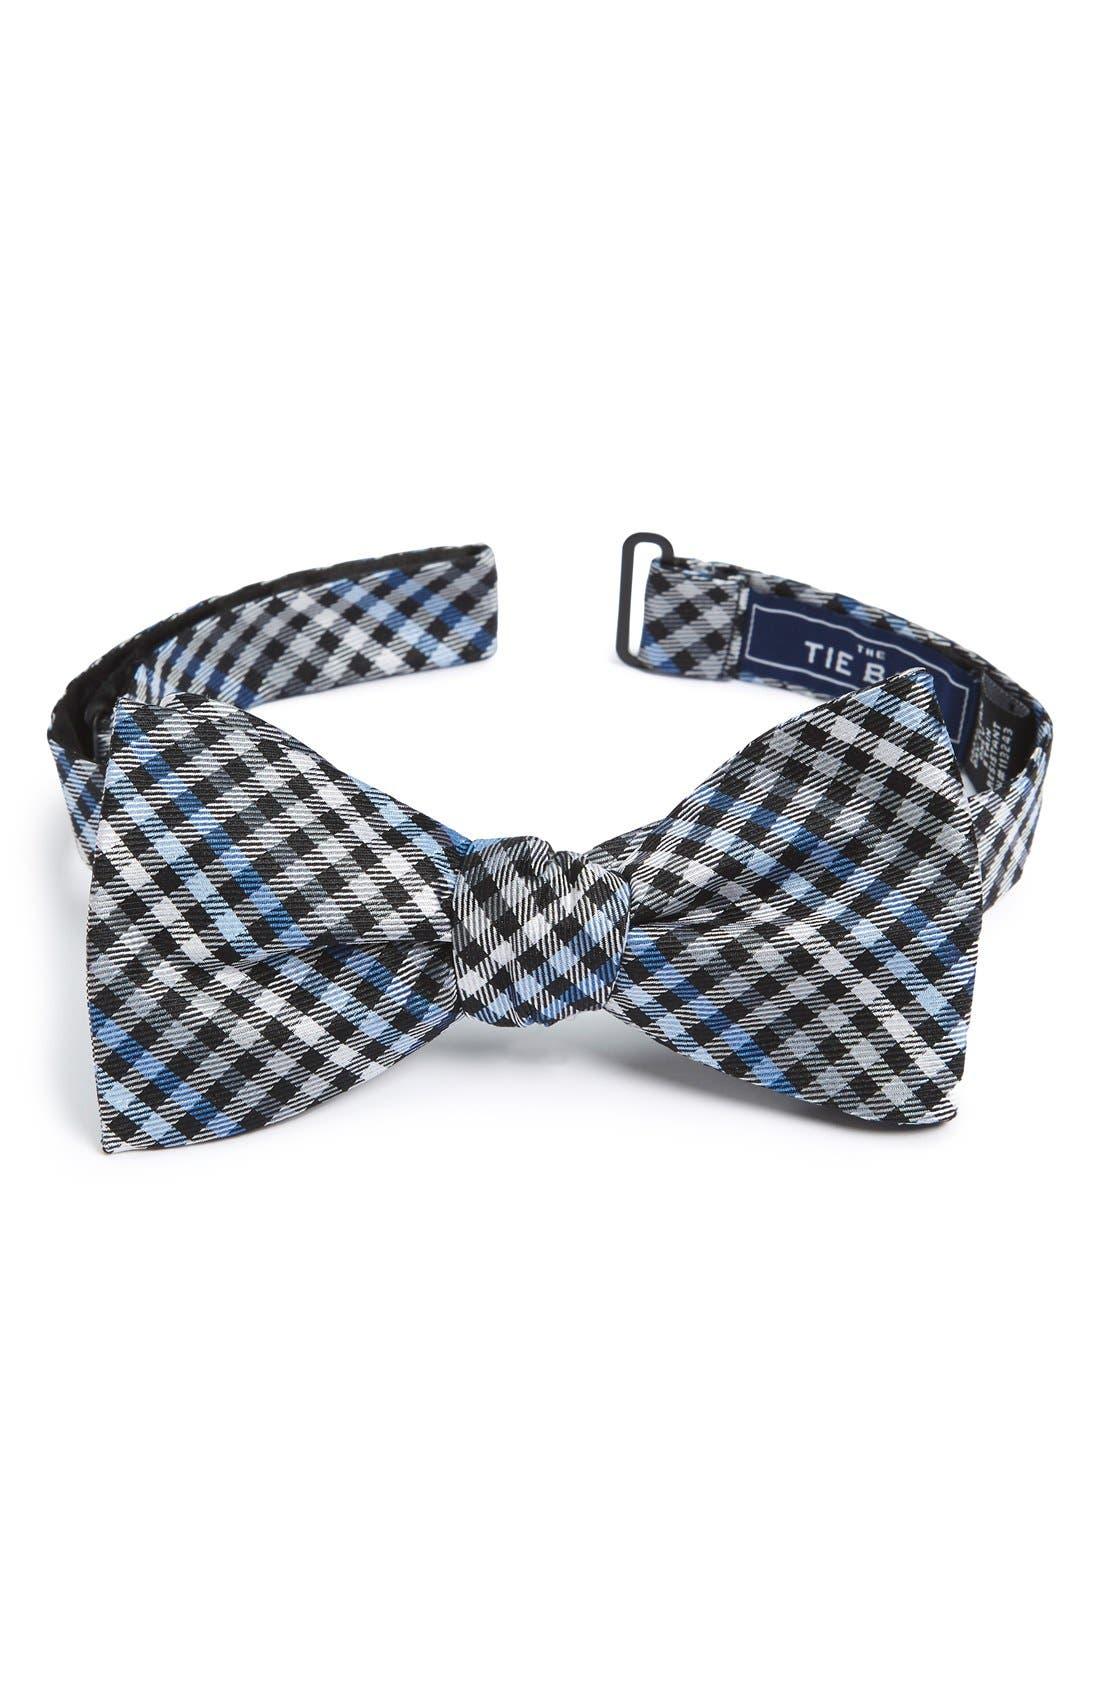 The Tie Bar Plaid Bow Tie